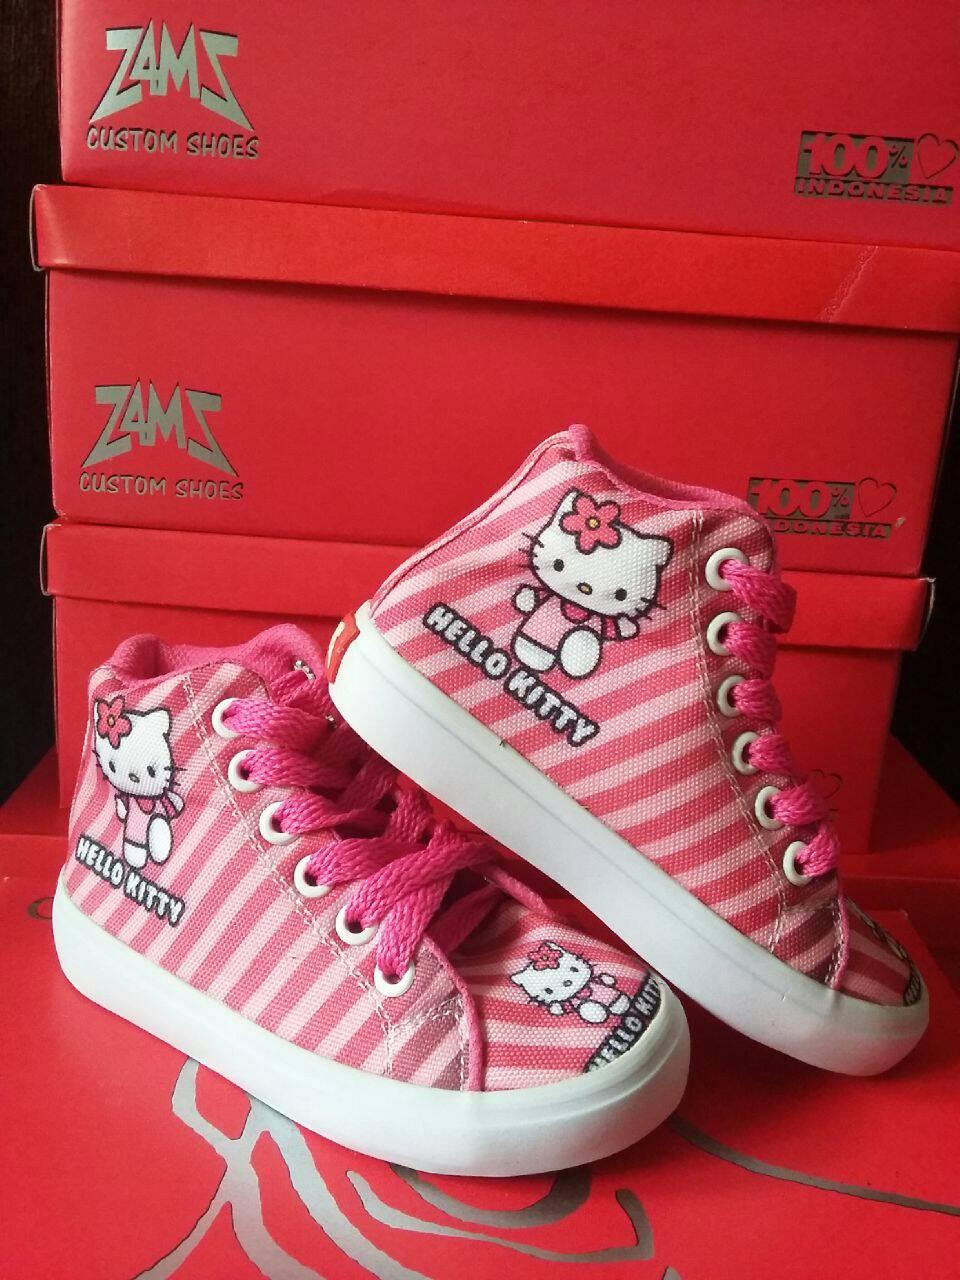 Jual Sepatu Karakter Hello Kitty Size 40 45 Tali Tinggi Po Anggaran Terbaik Kets Wanita Yutaka